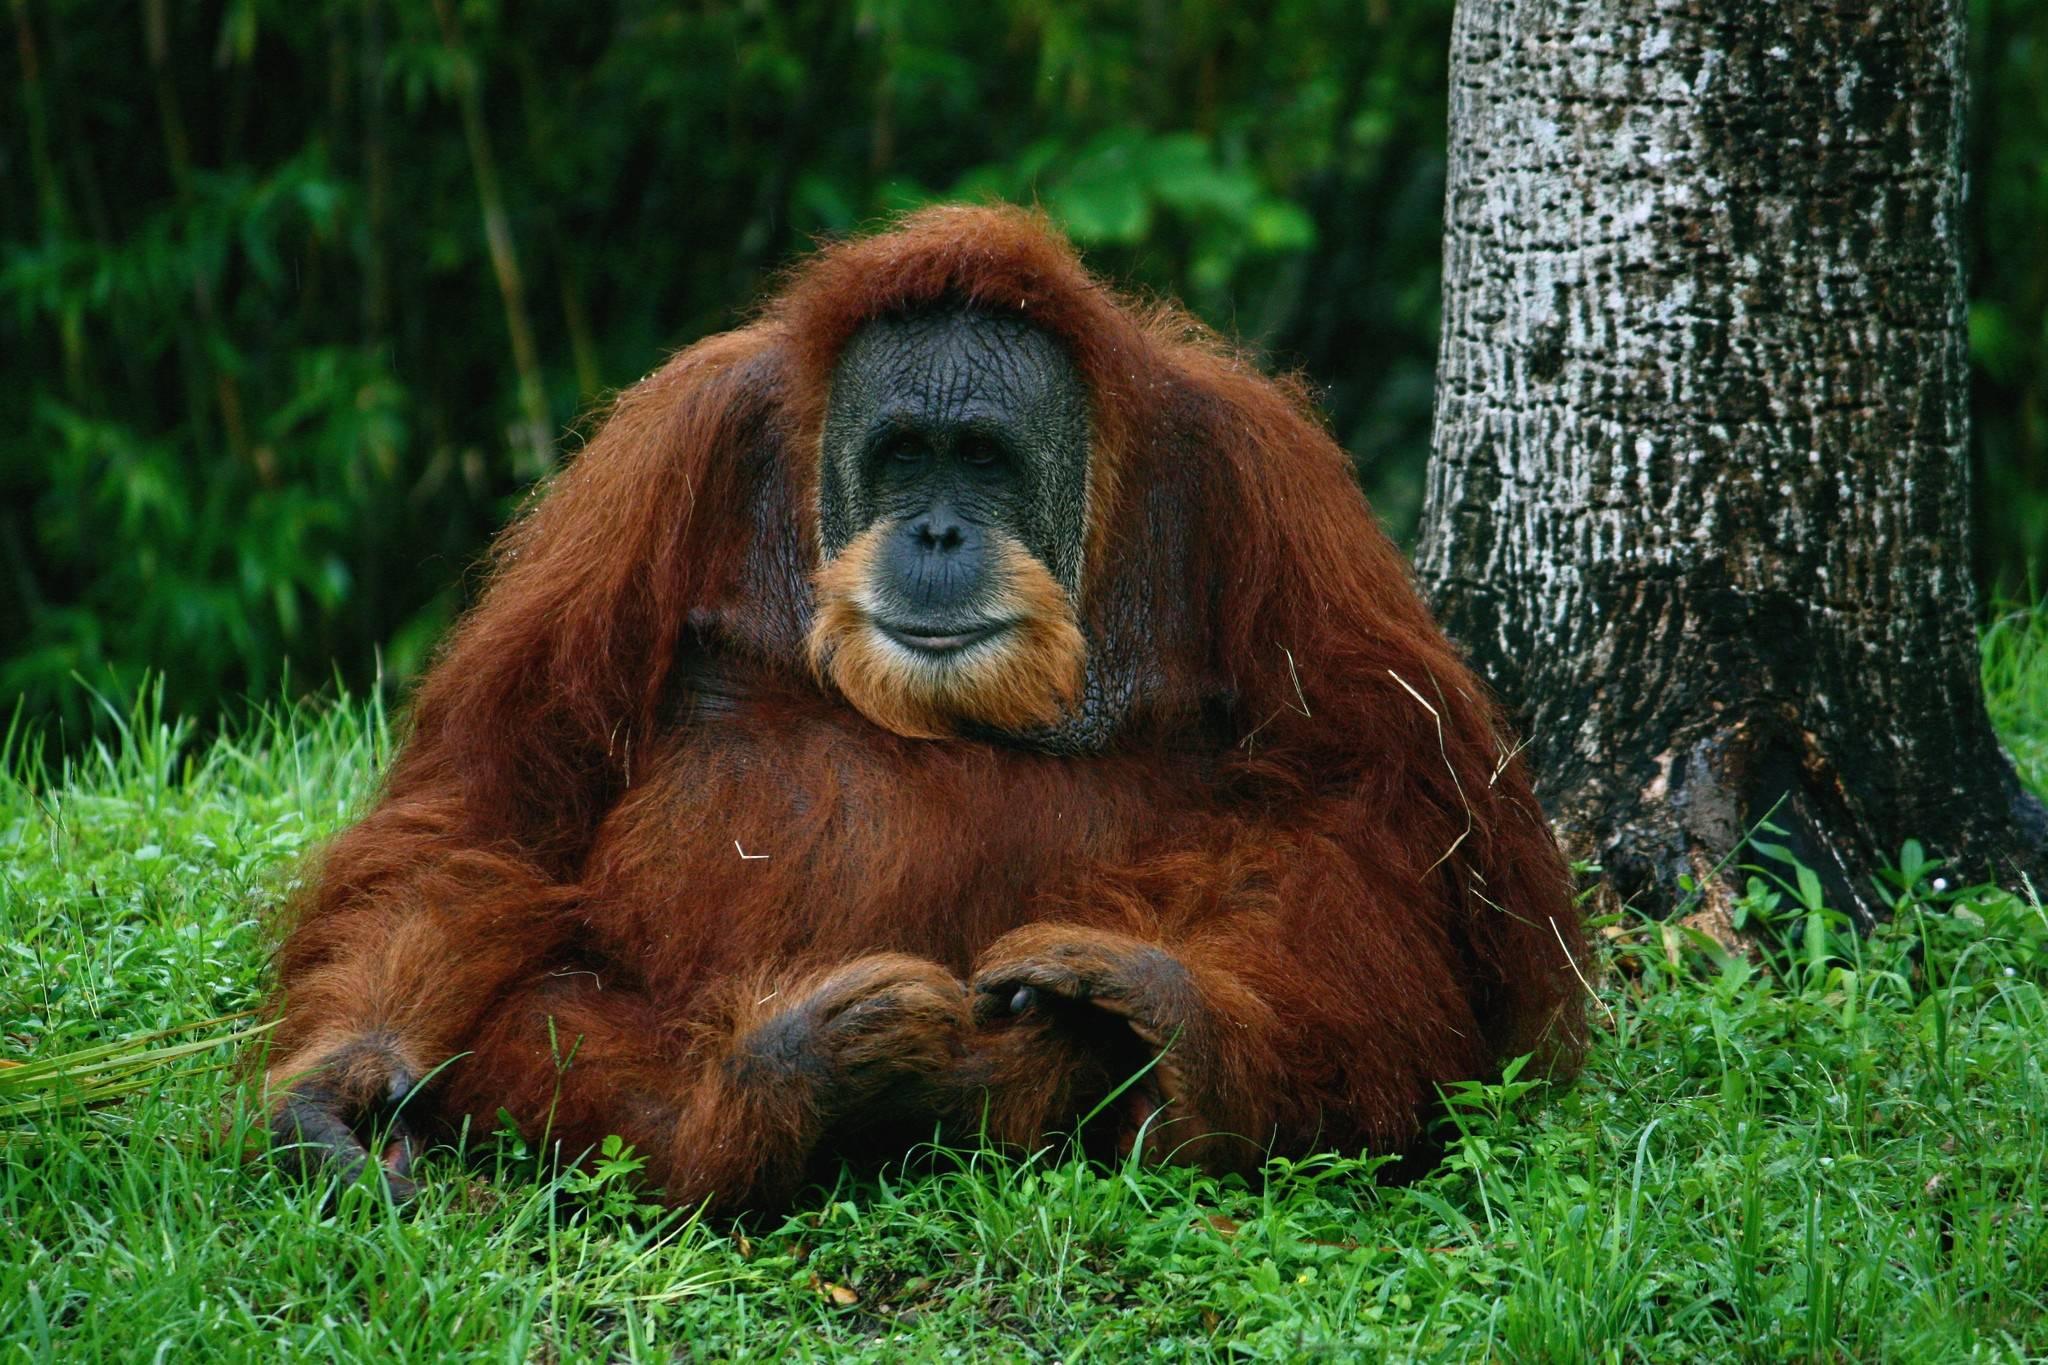 Orangutan Wallpapers Wallpaper Cave